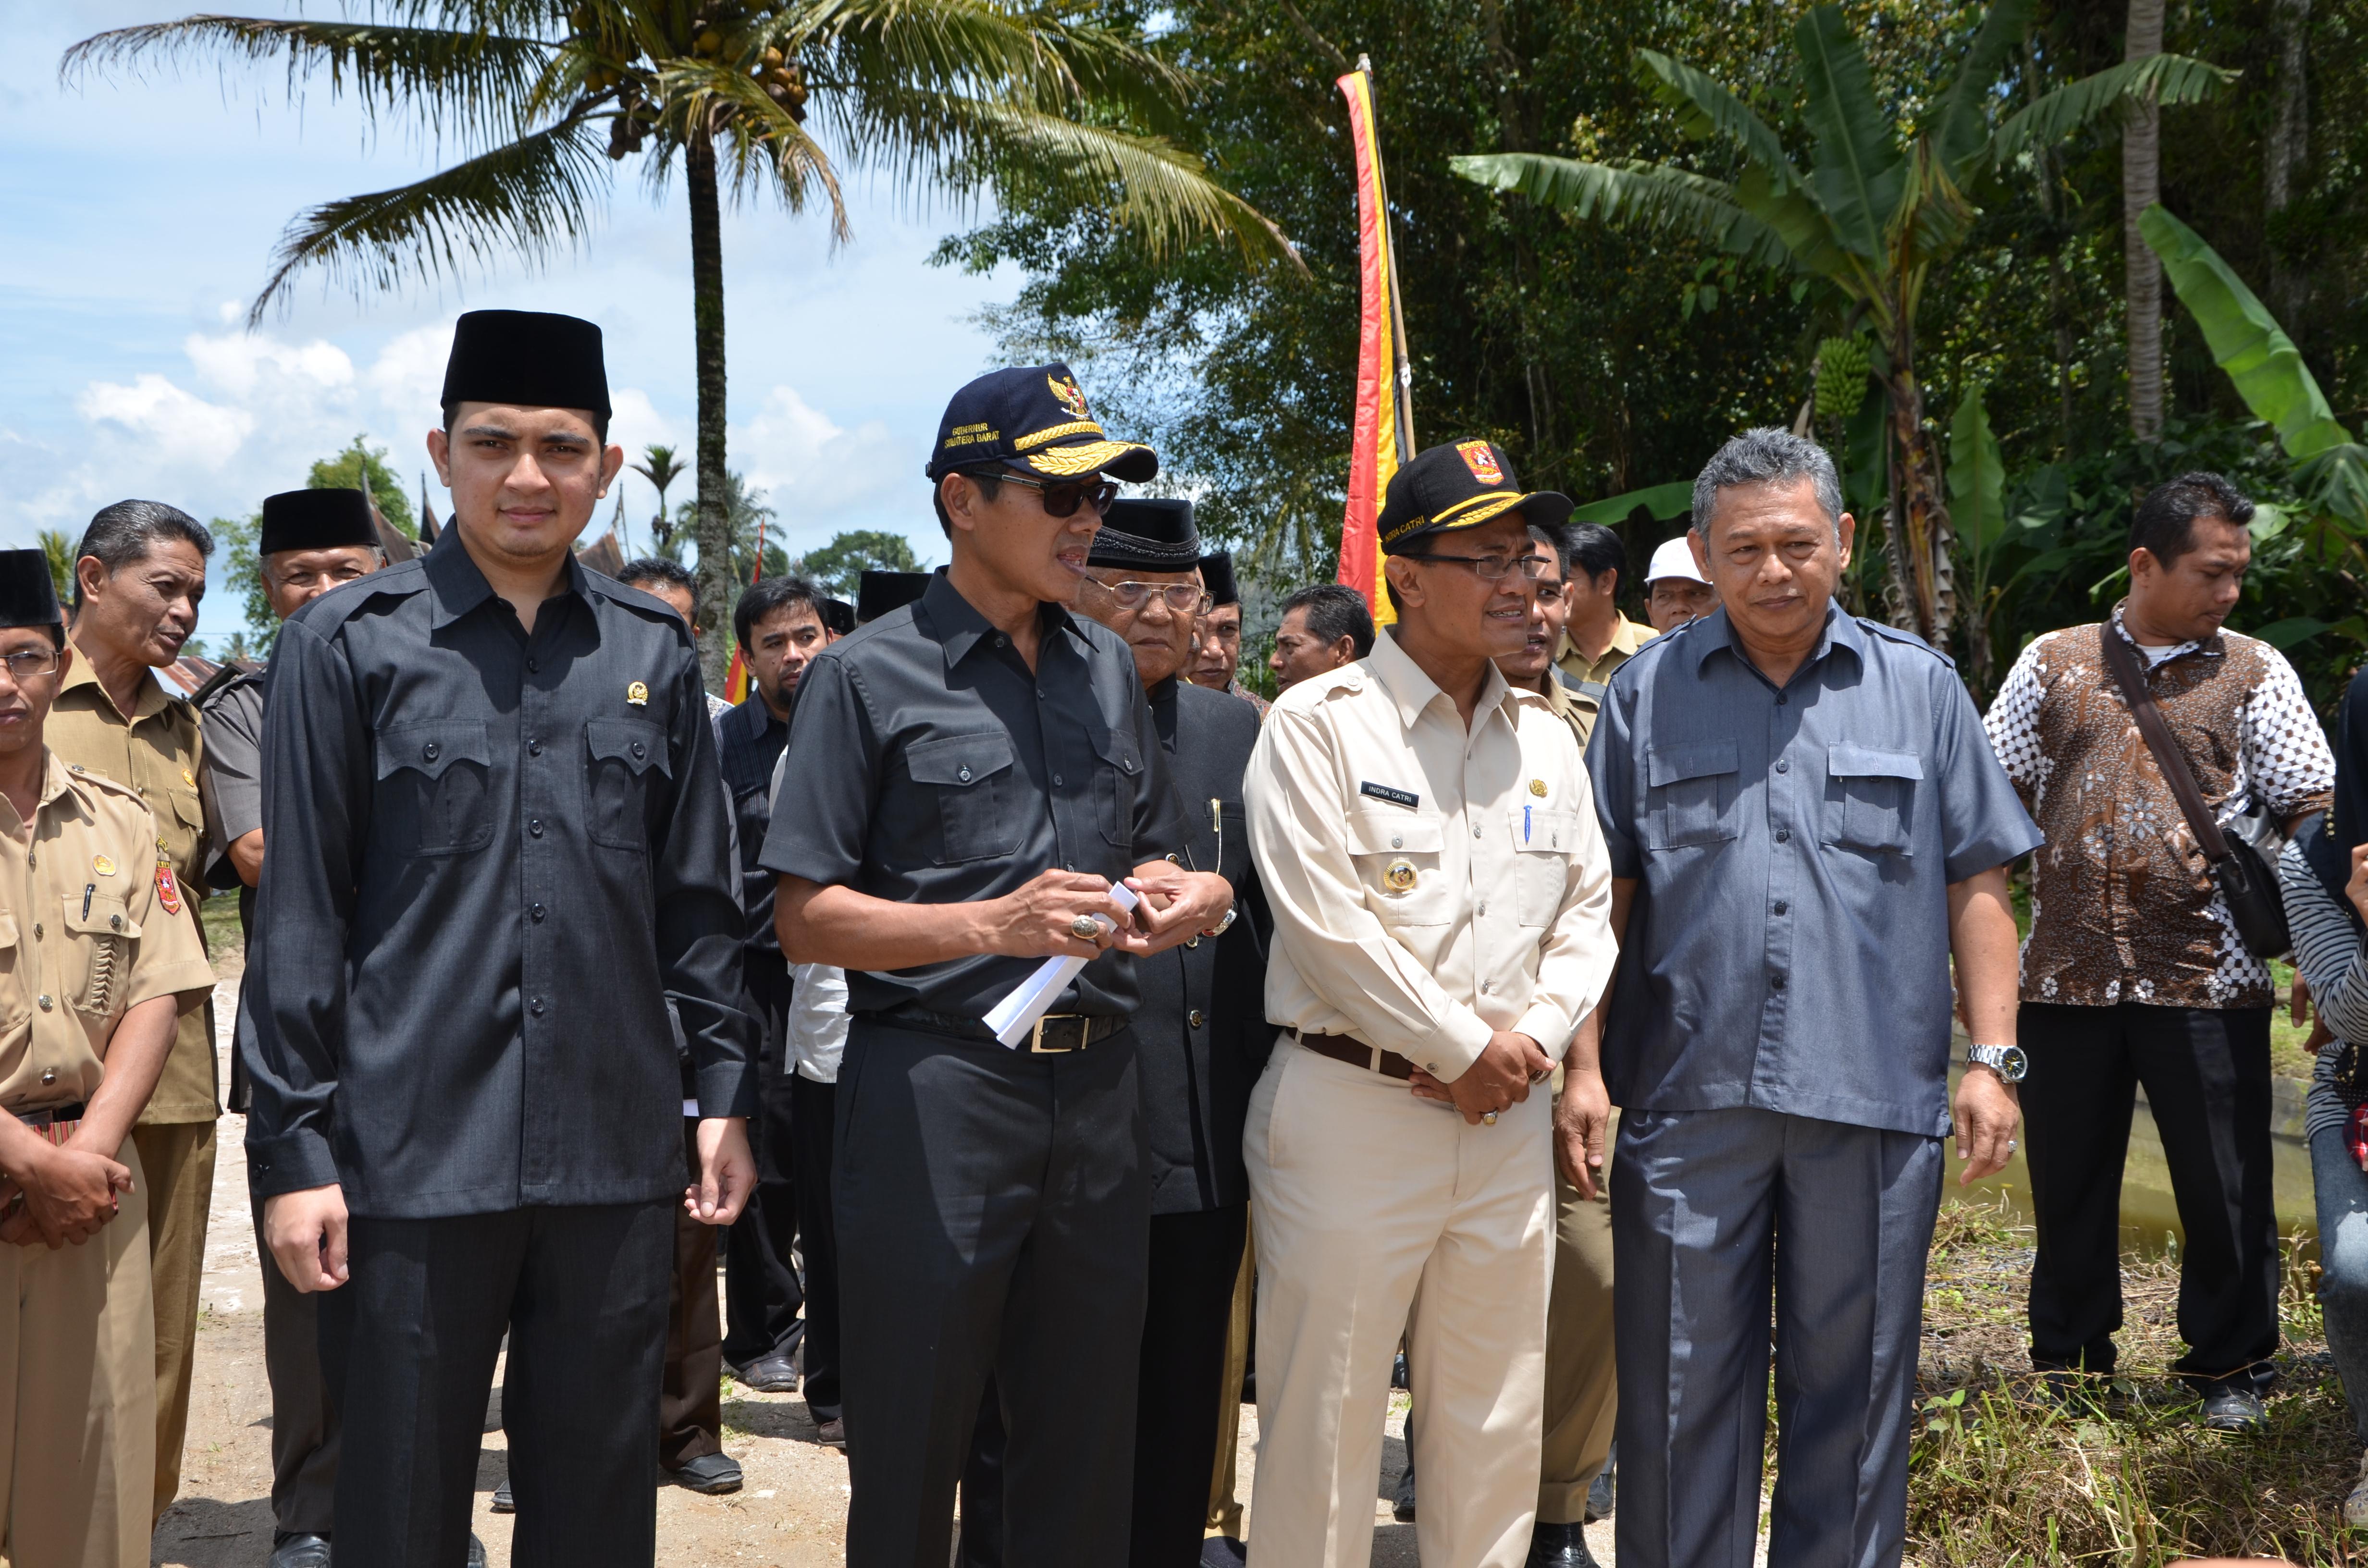 Sambutan Gubernur Sumatera Barat di Kabupaten Agam